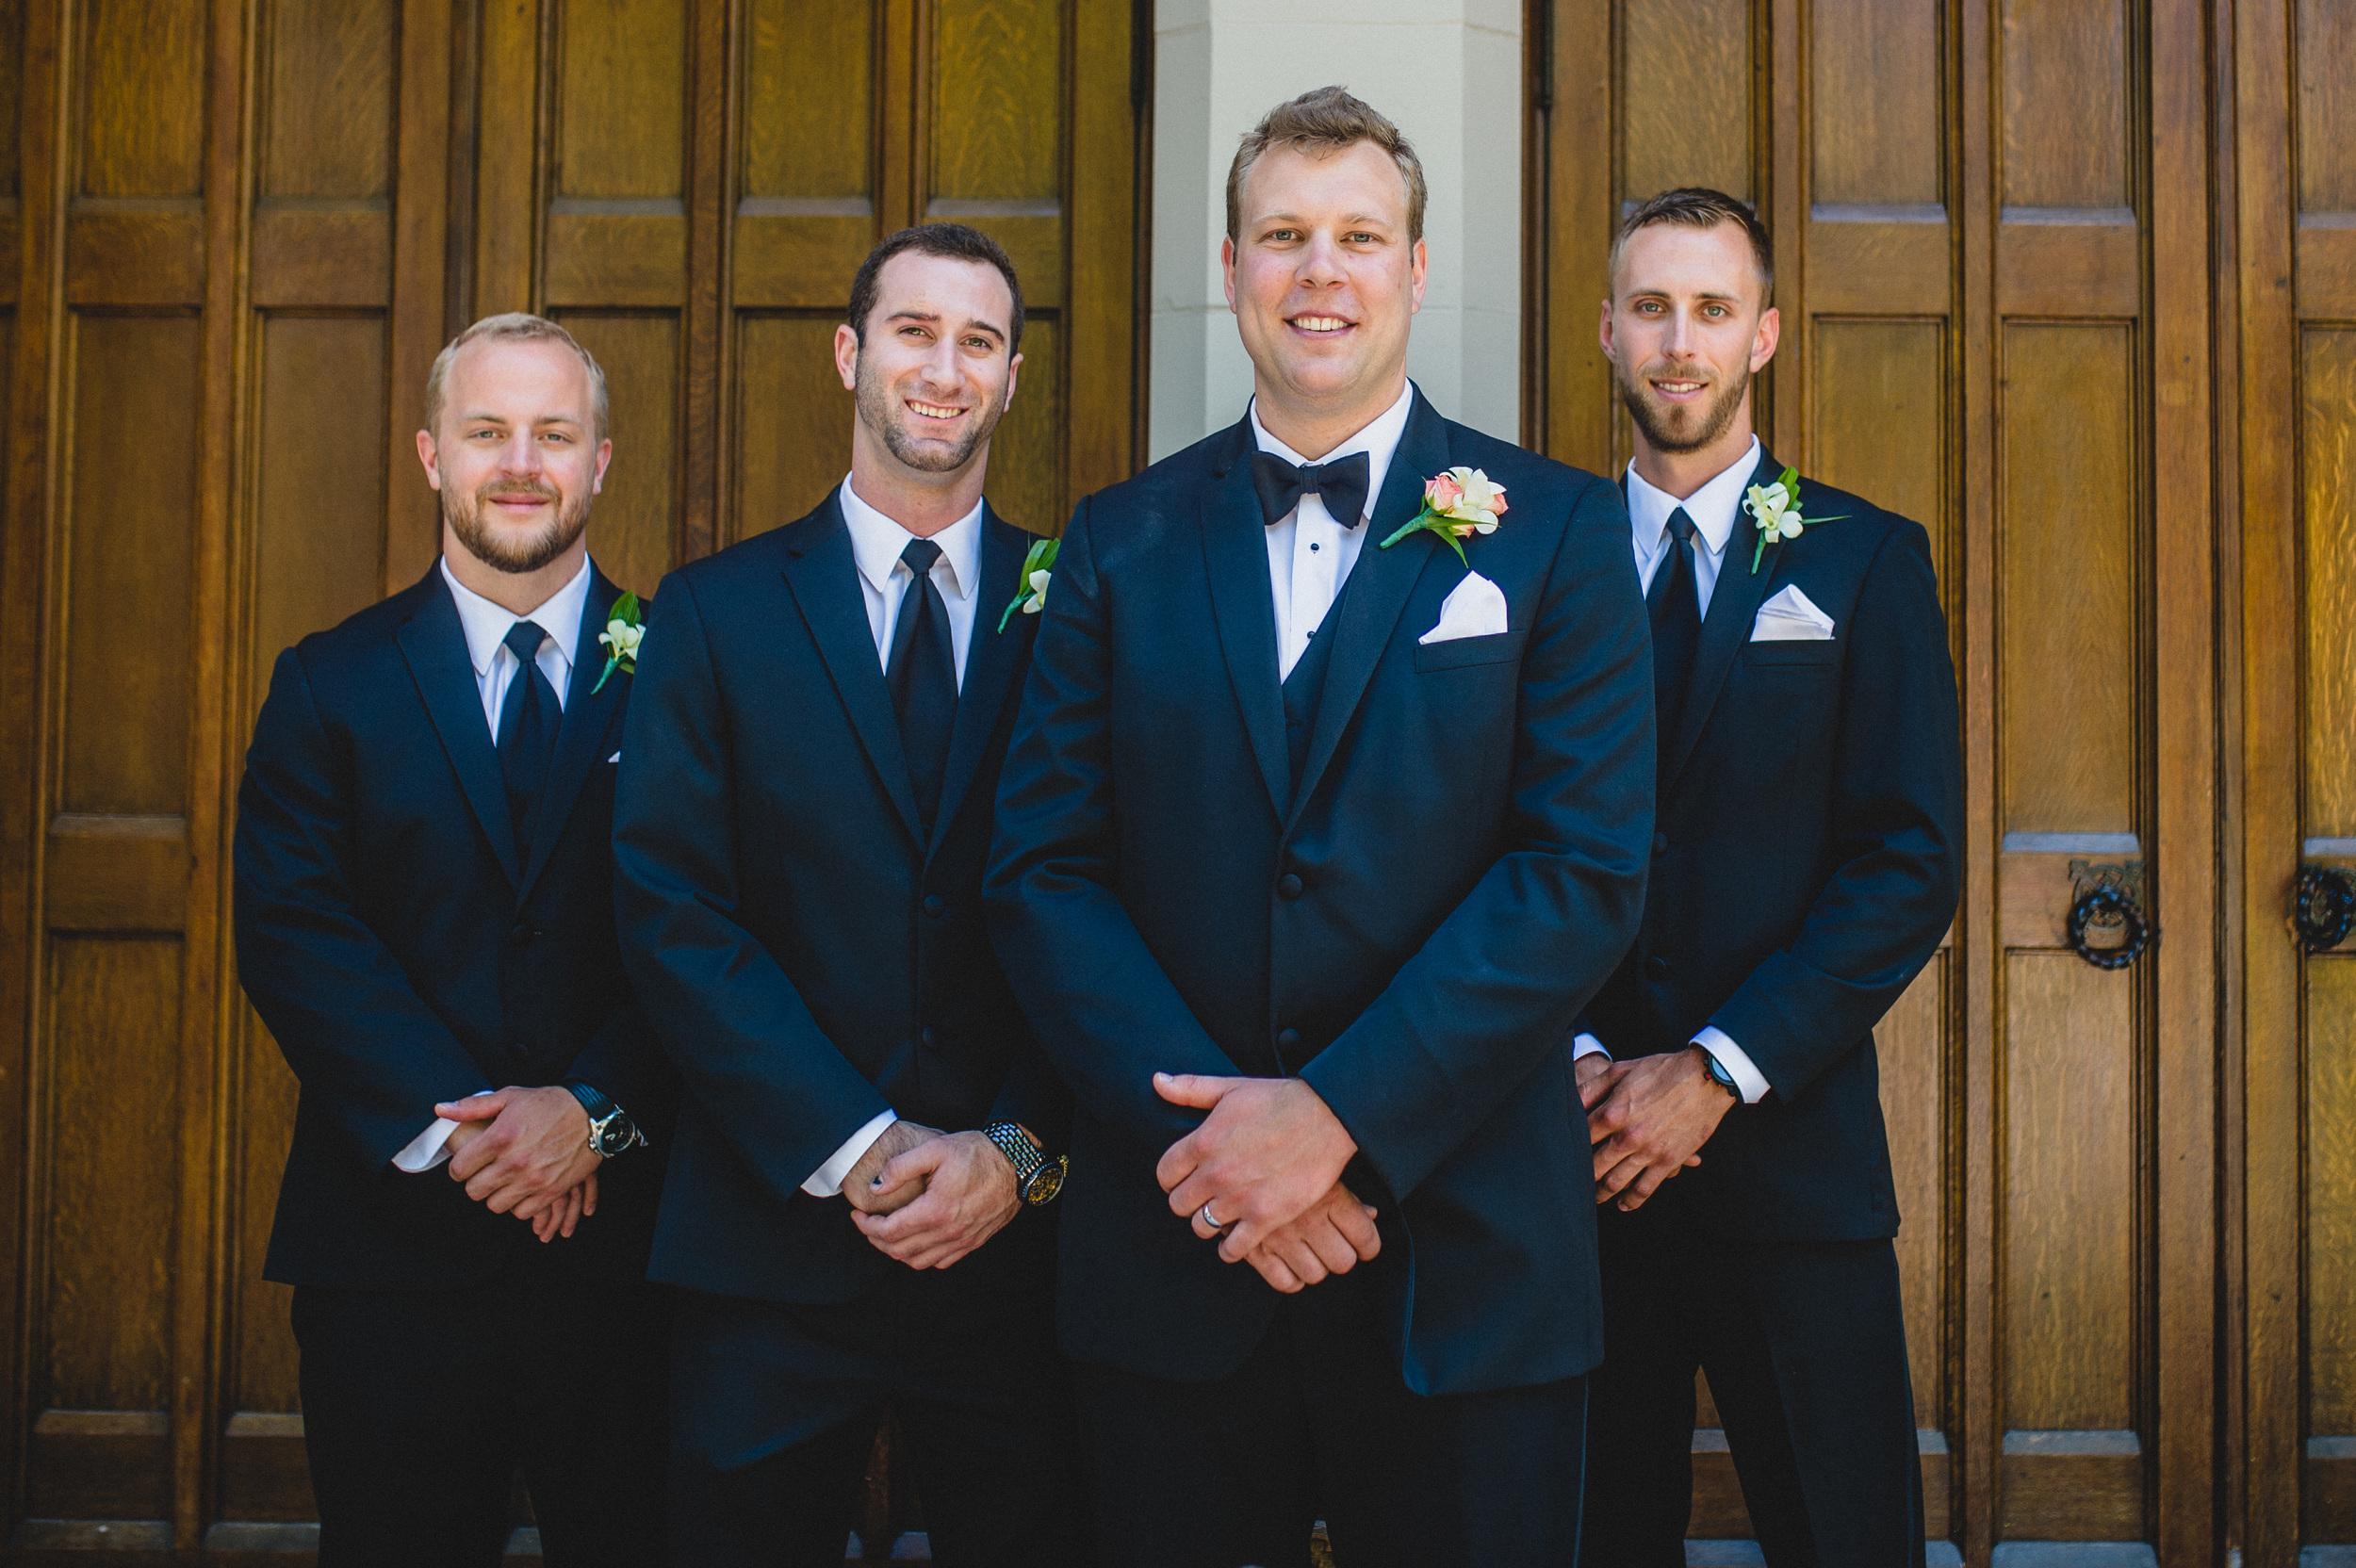 Vancouver St Augustine 's Church wedding photographer edward lai photography-56.jpg